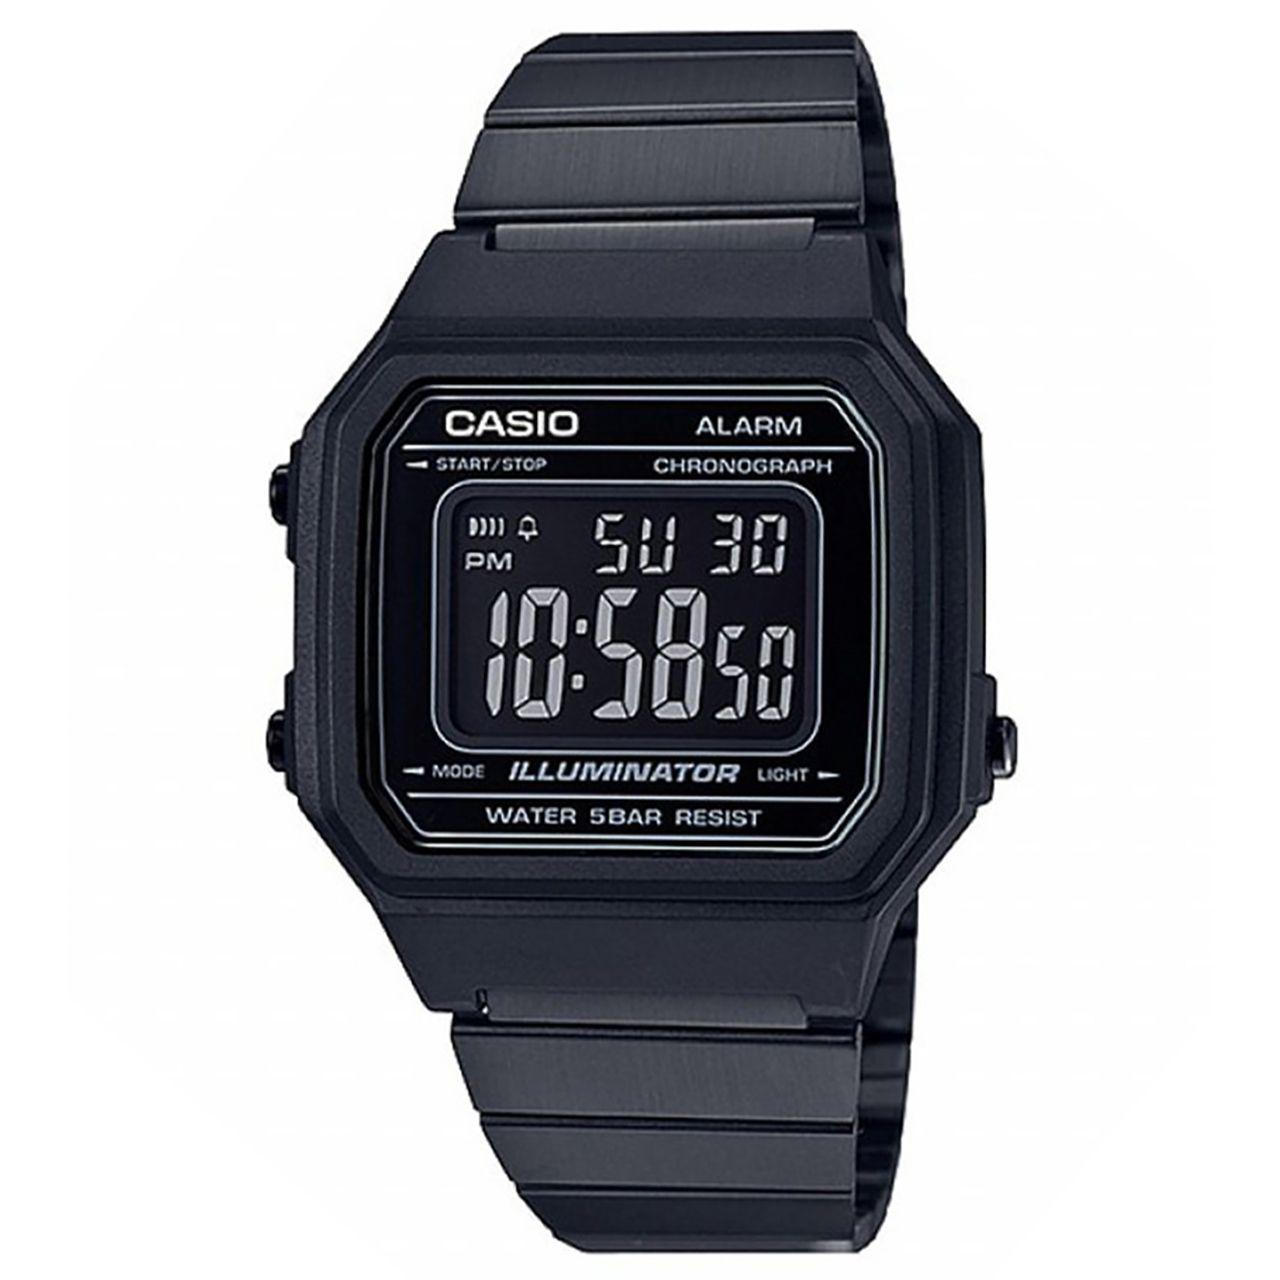 ساعت مچی دیجیتالی کاسیو مدل B650WB-1BDF -  - 2